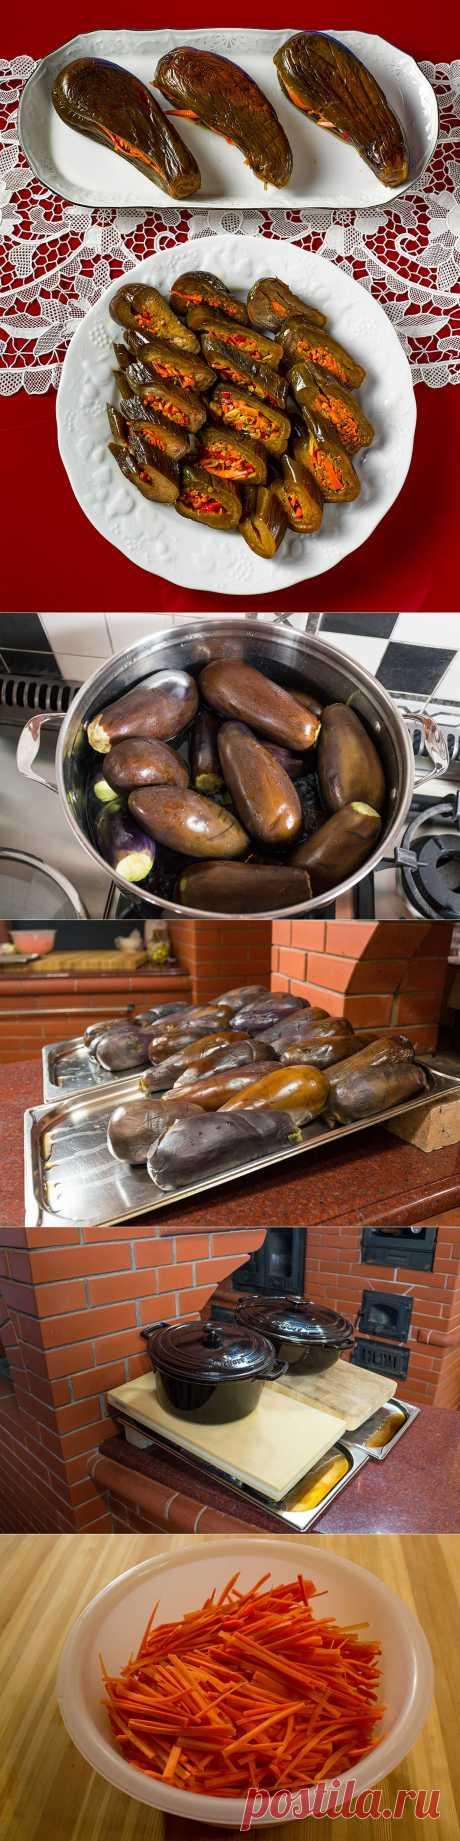 Marinated eggplants from Stalik.